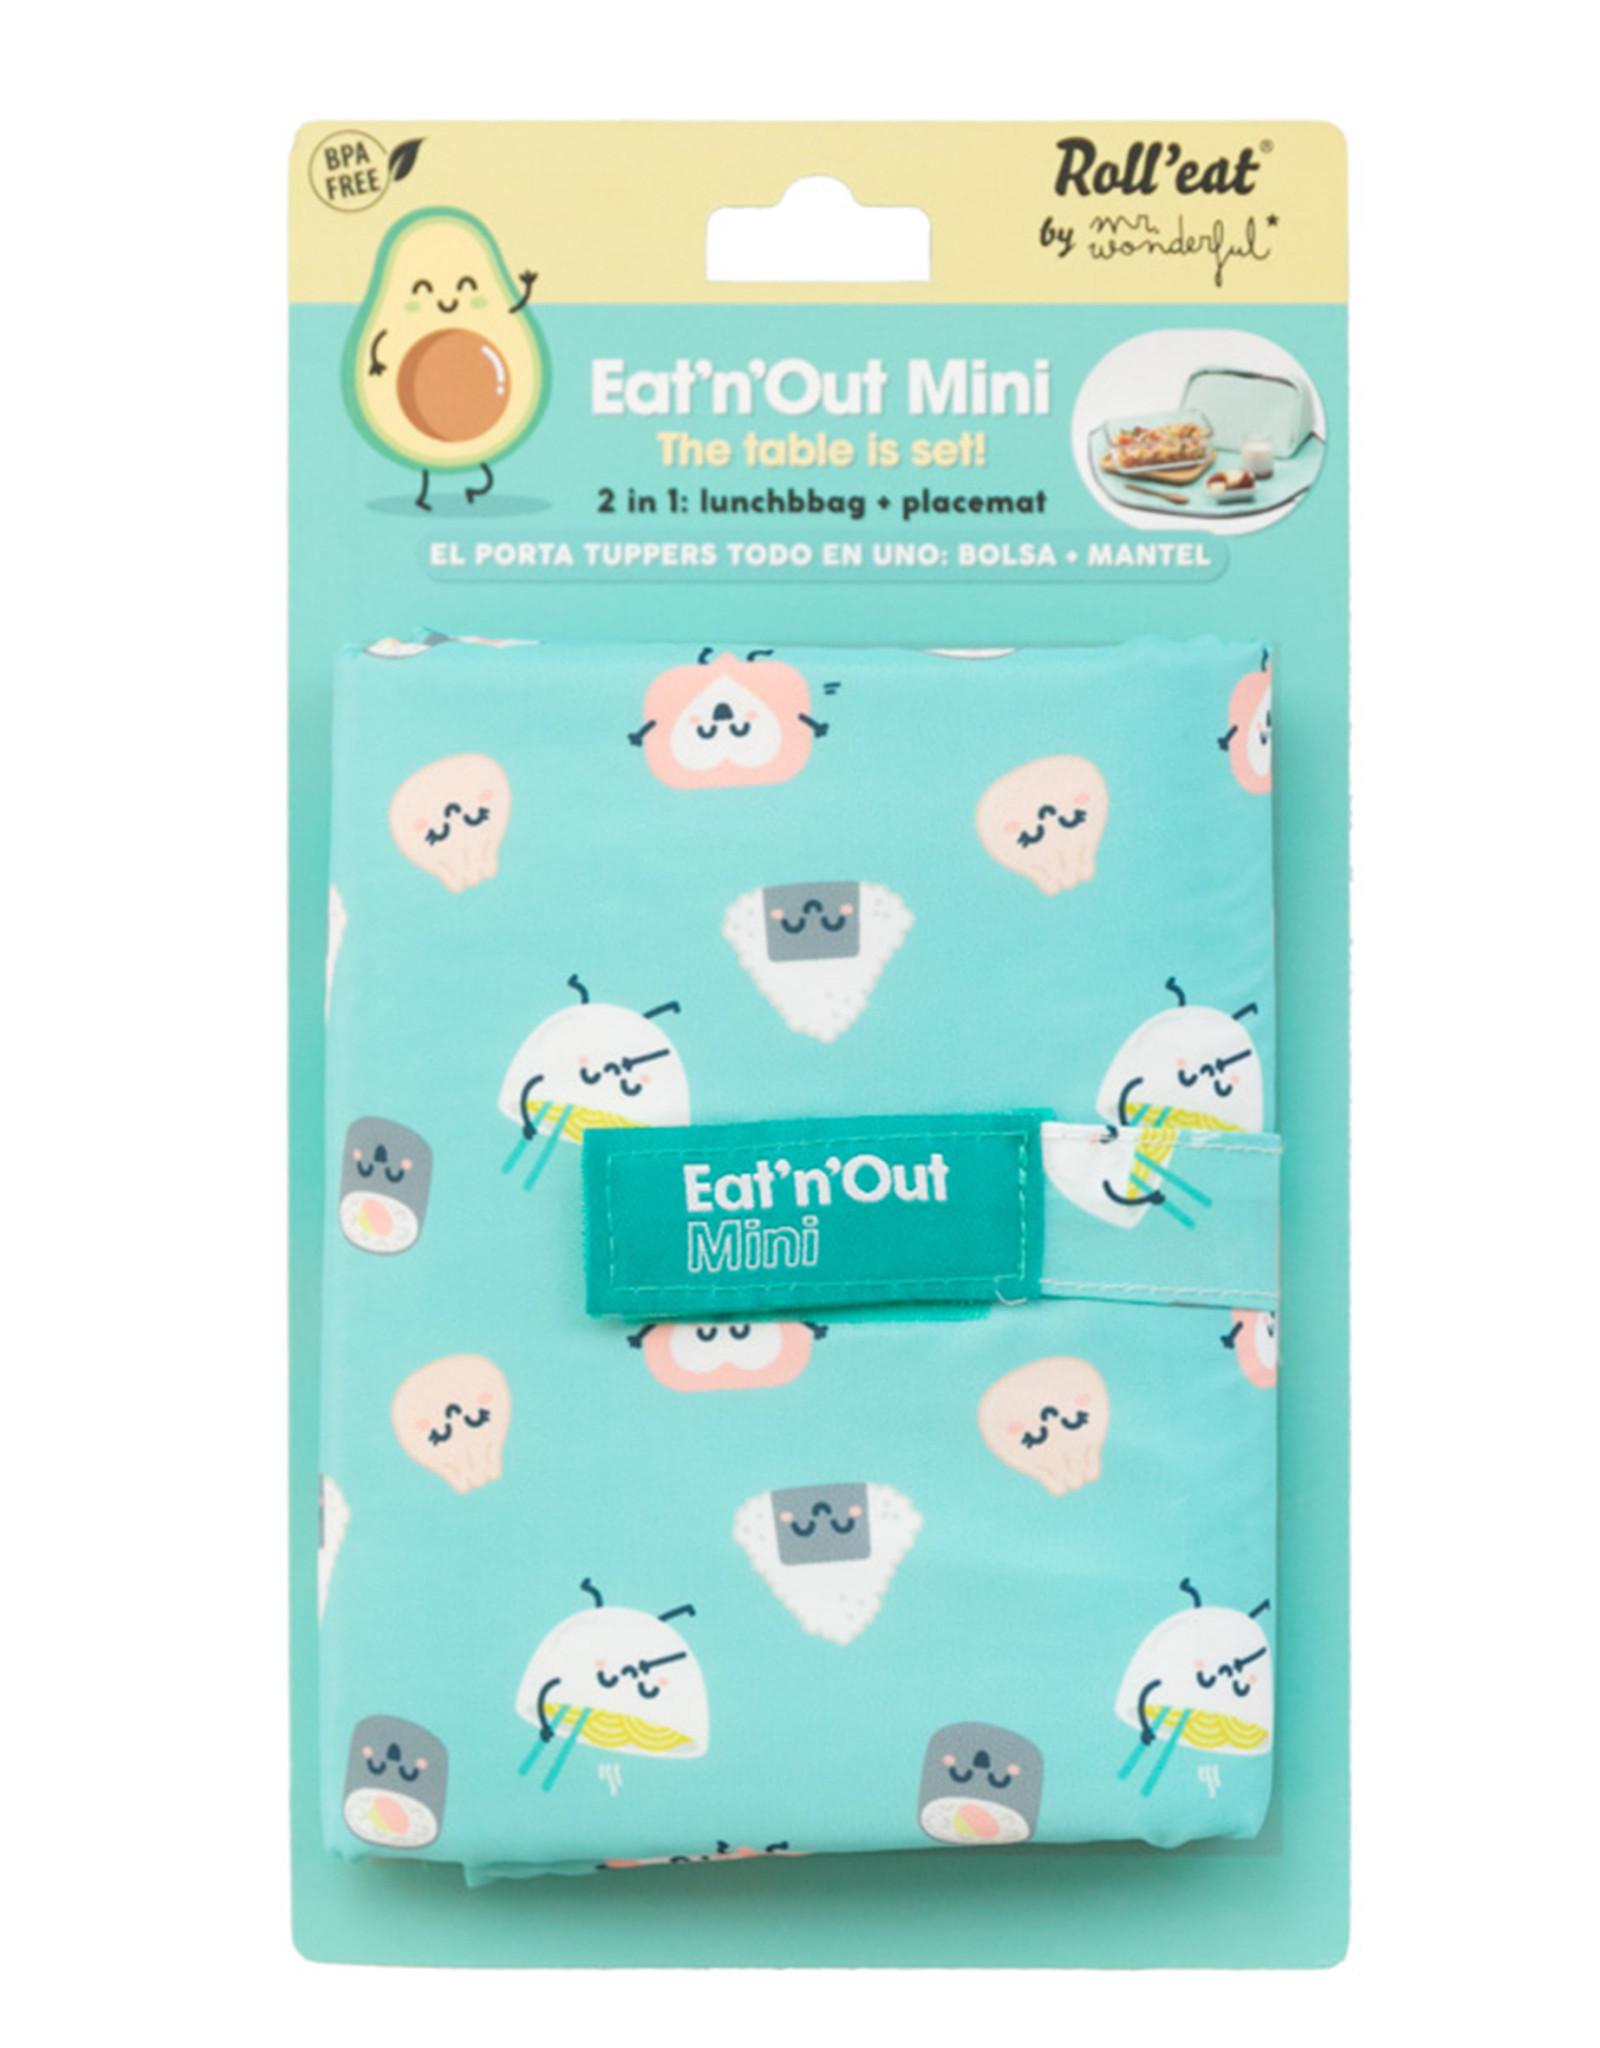 Roll'eat Boc'n'Roll Mr Wonderful - Eat'n'Out Mini Sushi